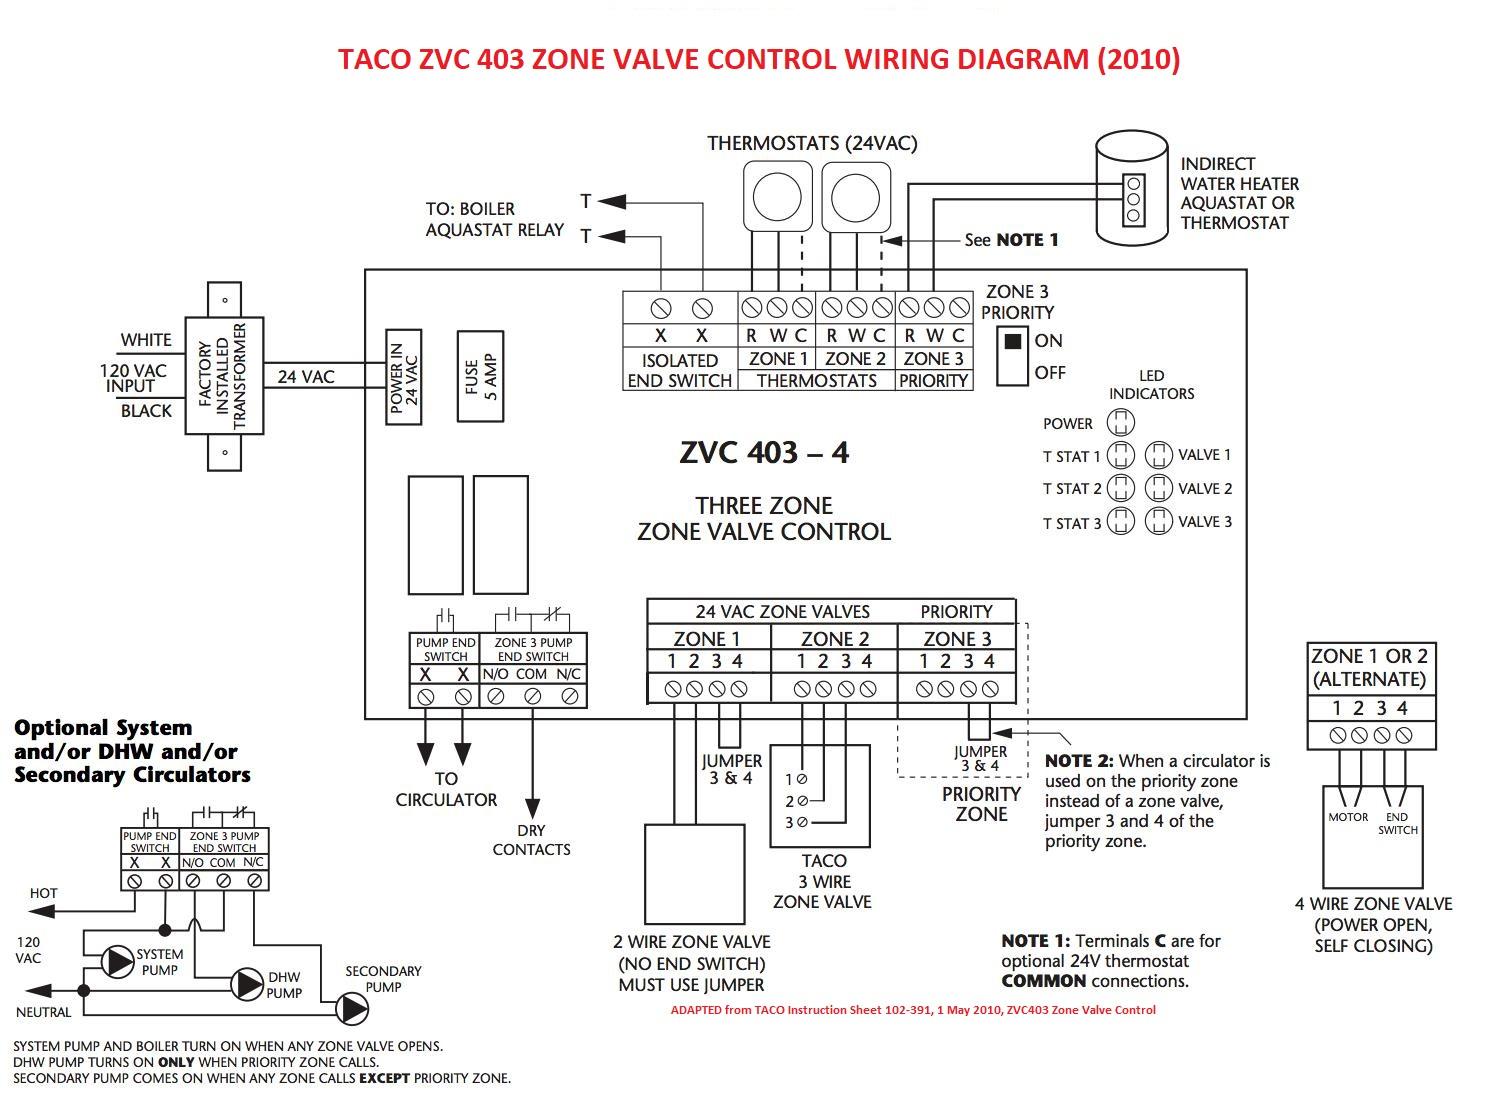 honeywell v8043e wiring diagram simple wiring diagram site honeywell triple aquastat r8182a wiring honeywell v8043f wiring diagram just another wiring diagram blog \\u2022 honywell 8200123 gas valve wiring diagram honeywell v8043e wiring diagram